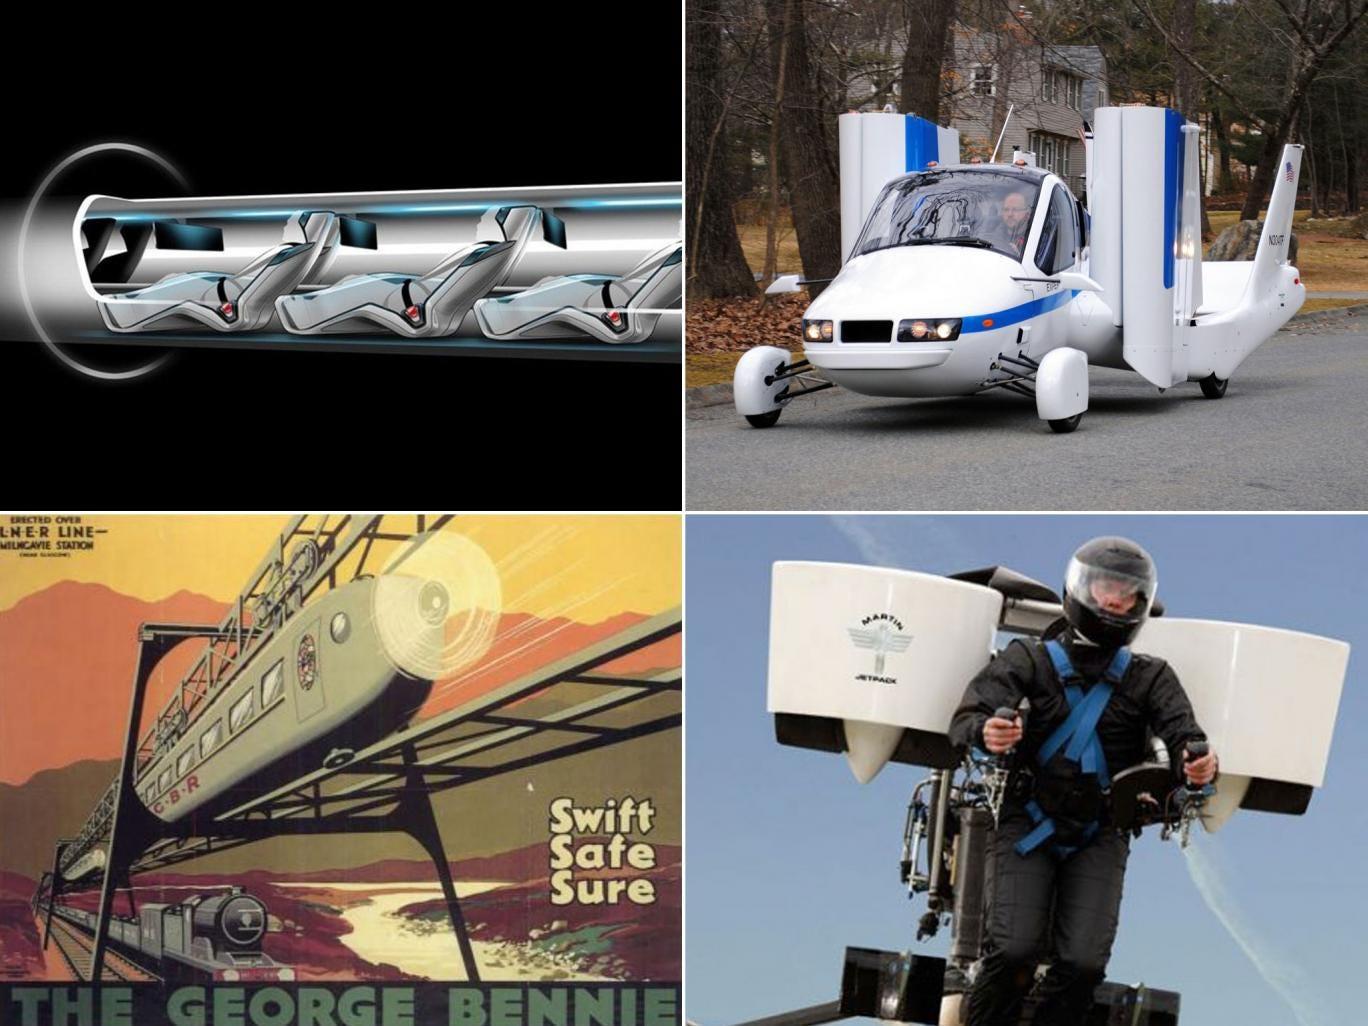 Flights of fancy (clockwise): Hyperloop, Transition, the jetpack and the Bennie Railplane